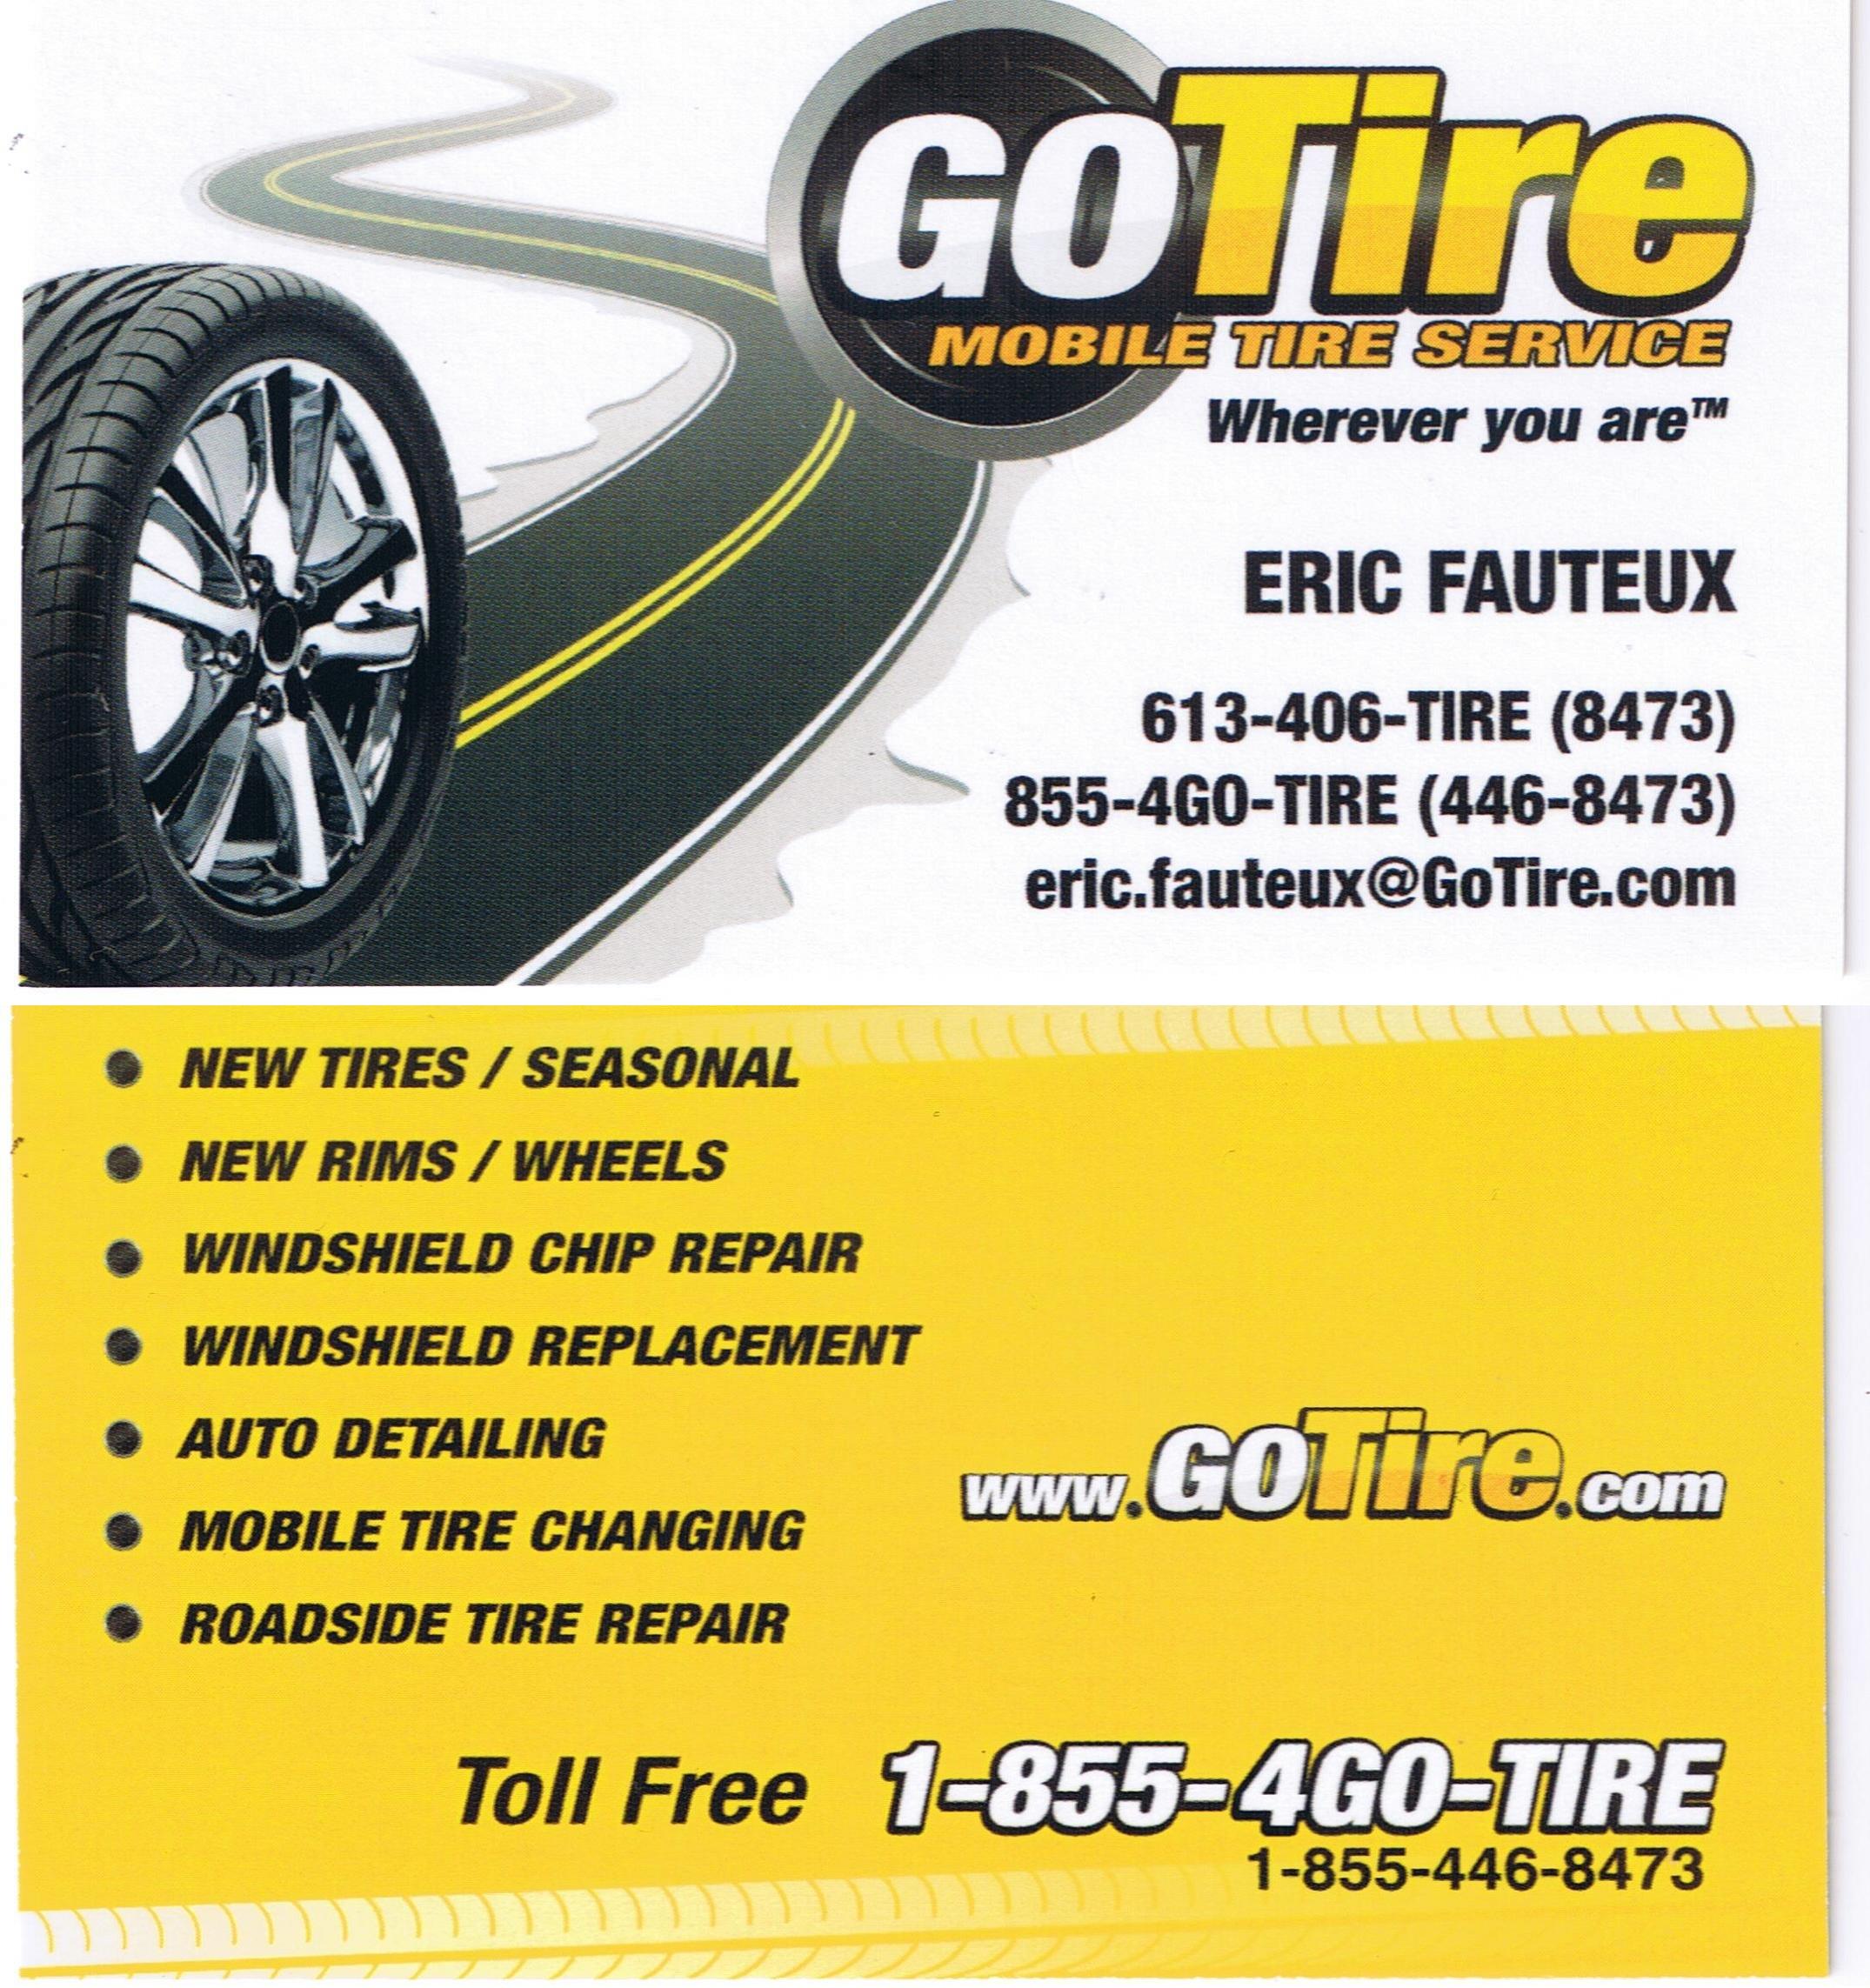 Ottawa MG Club » Mobile Tire Services